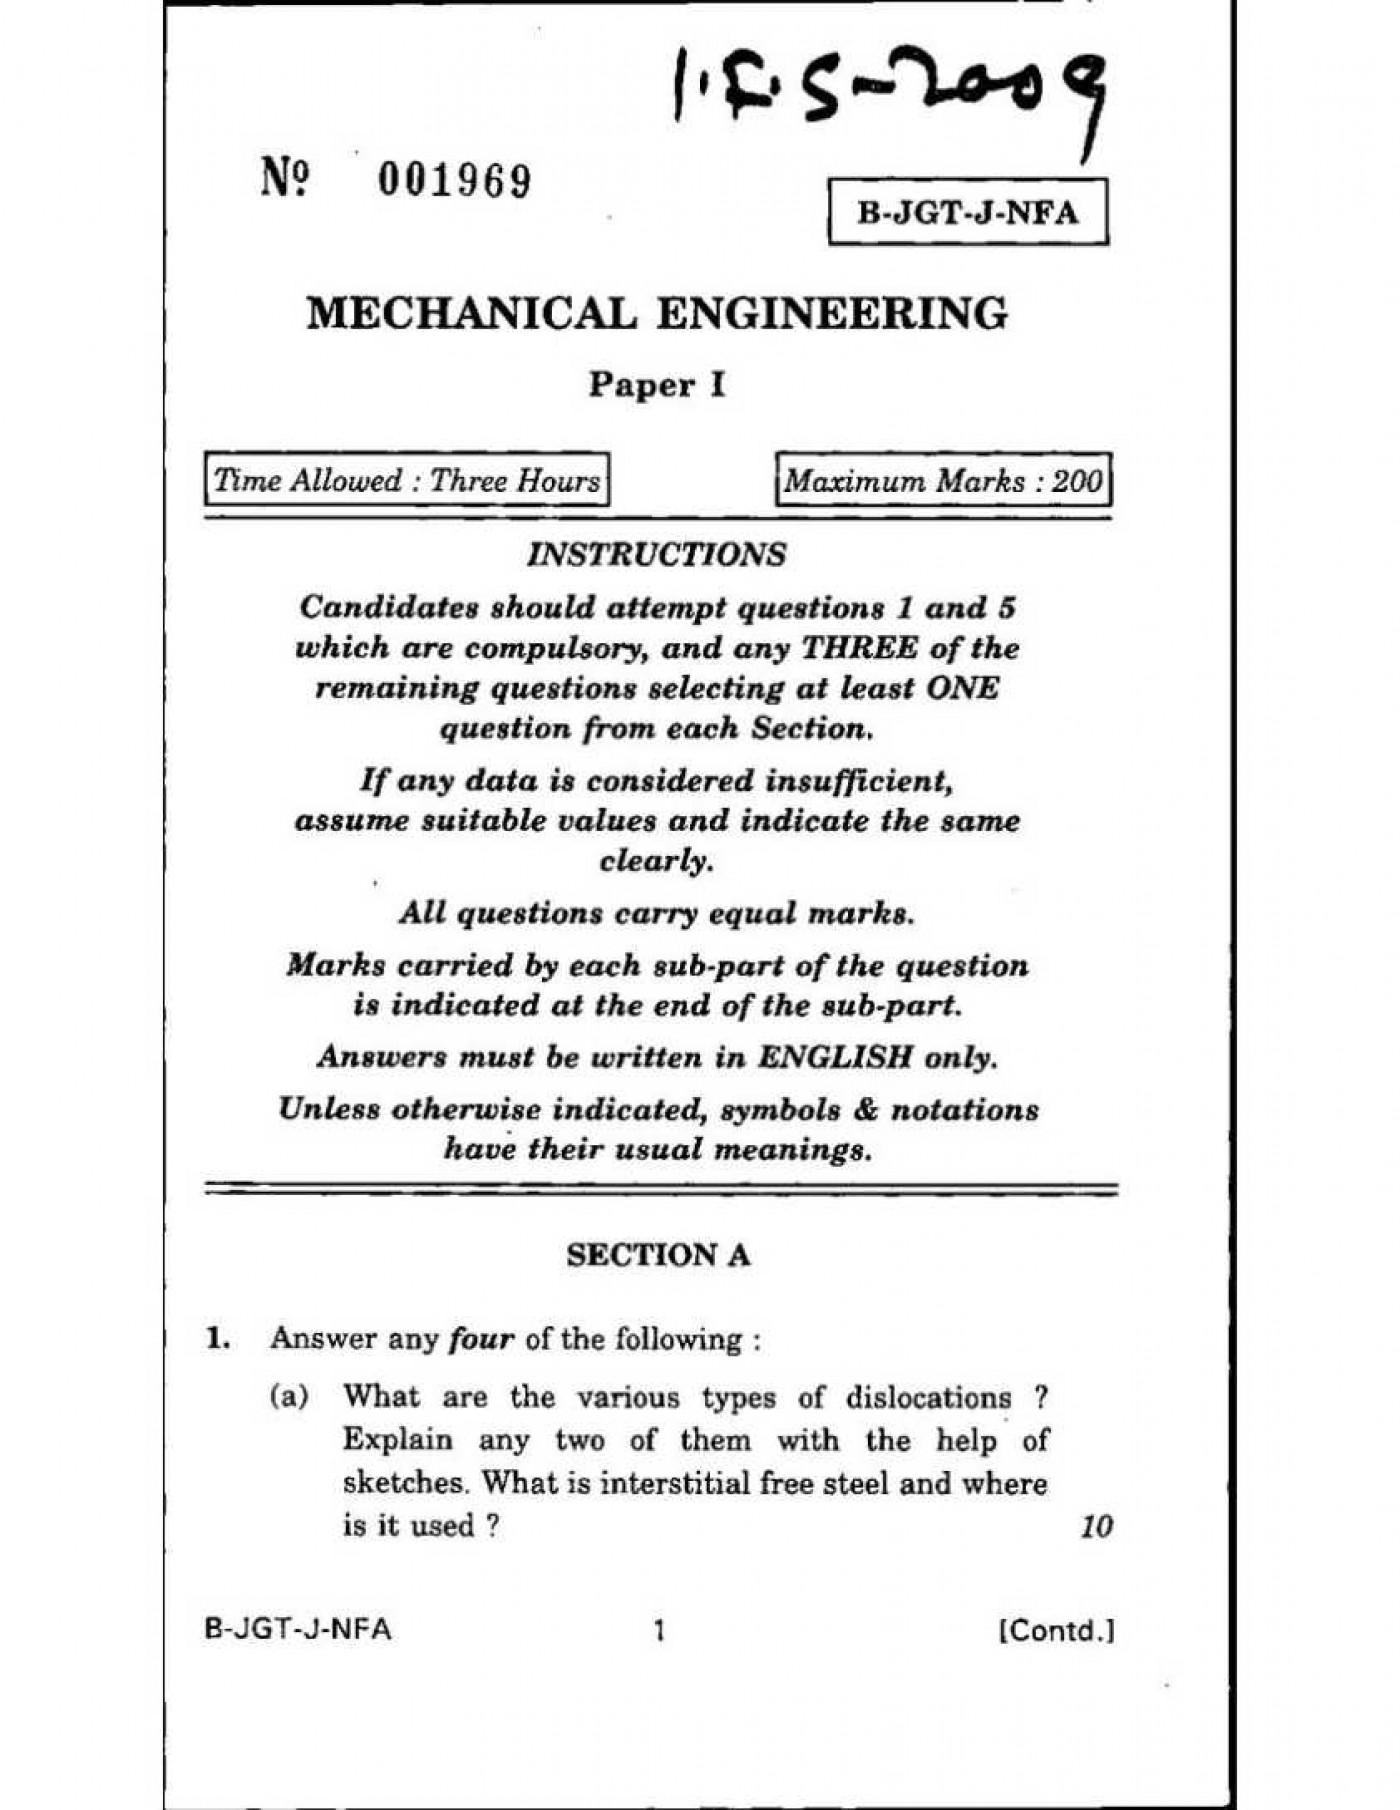 011 mechanical engineering essay topics example essays